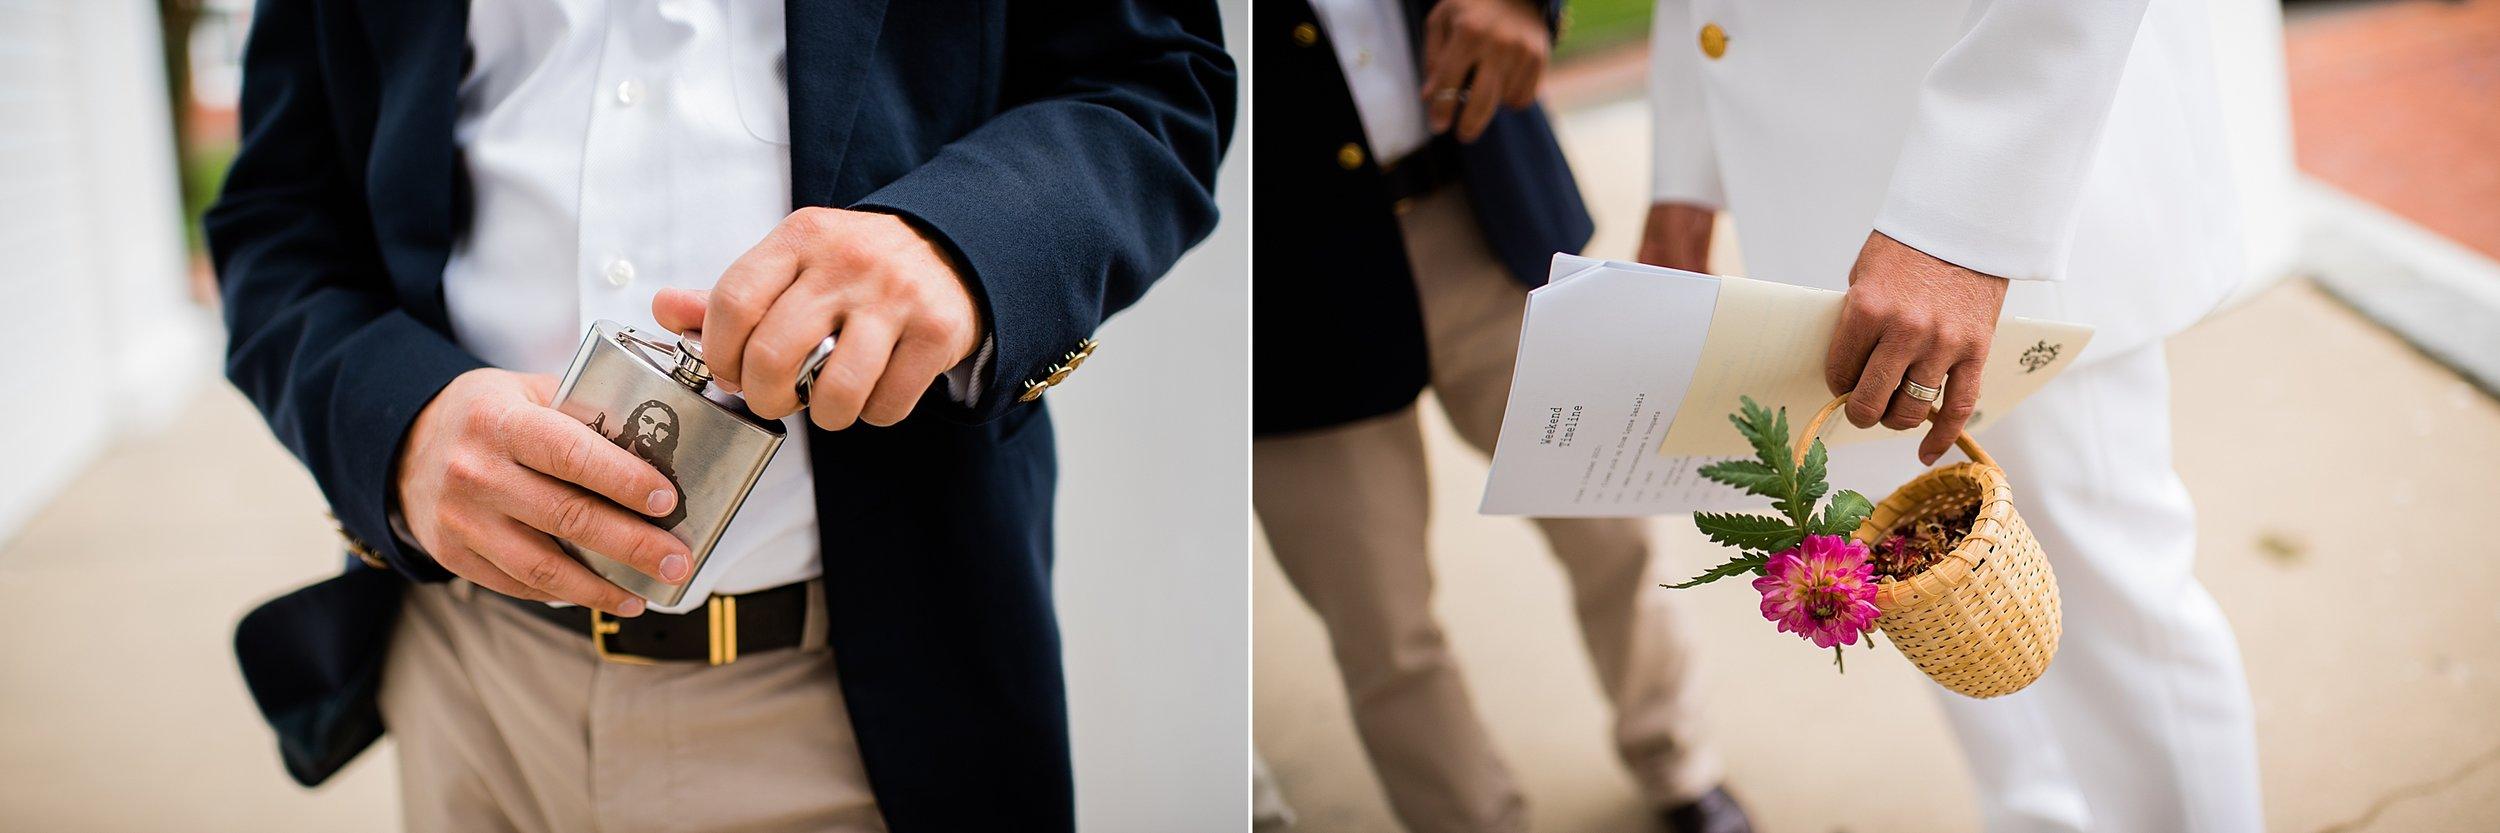 020 marthas vineyard wedding photographer todd danforth photography.jpg